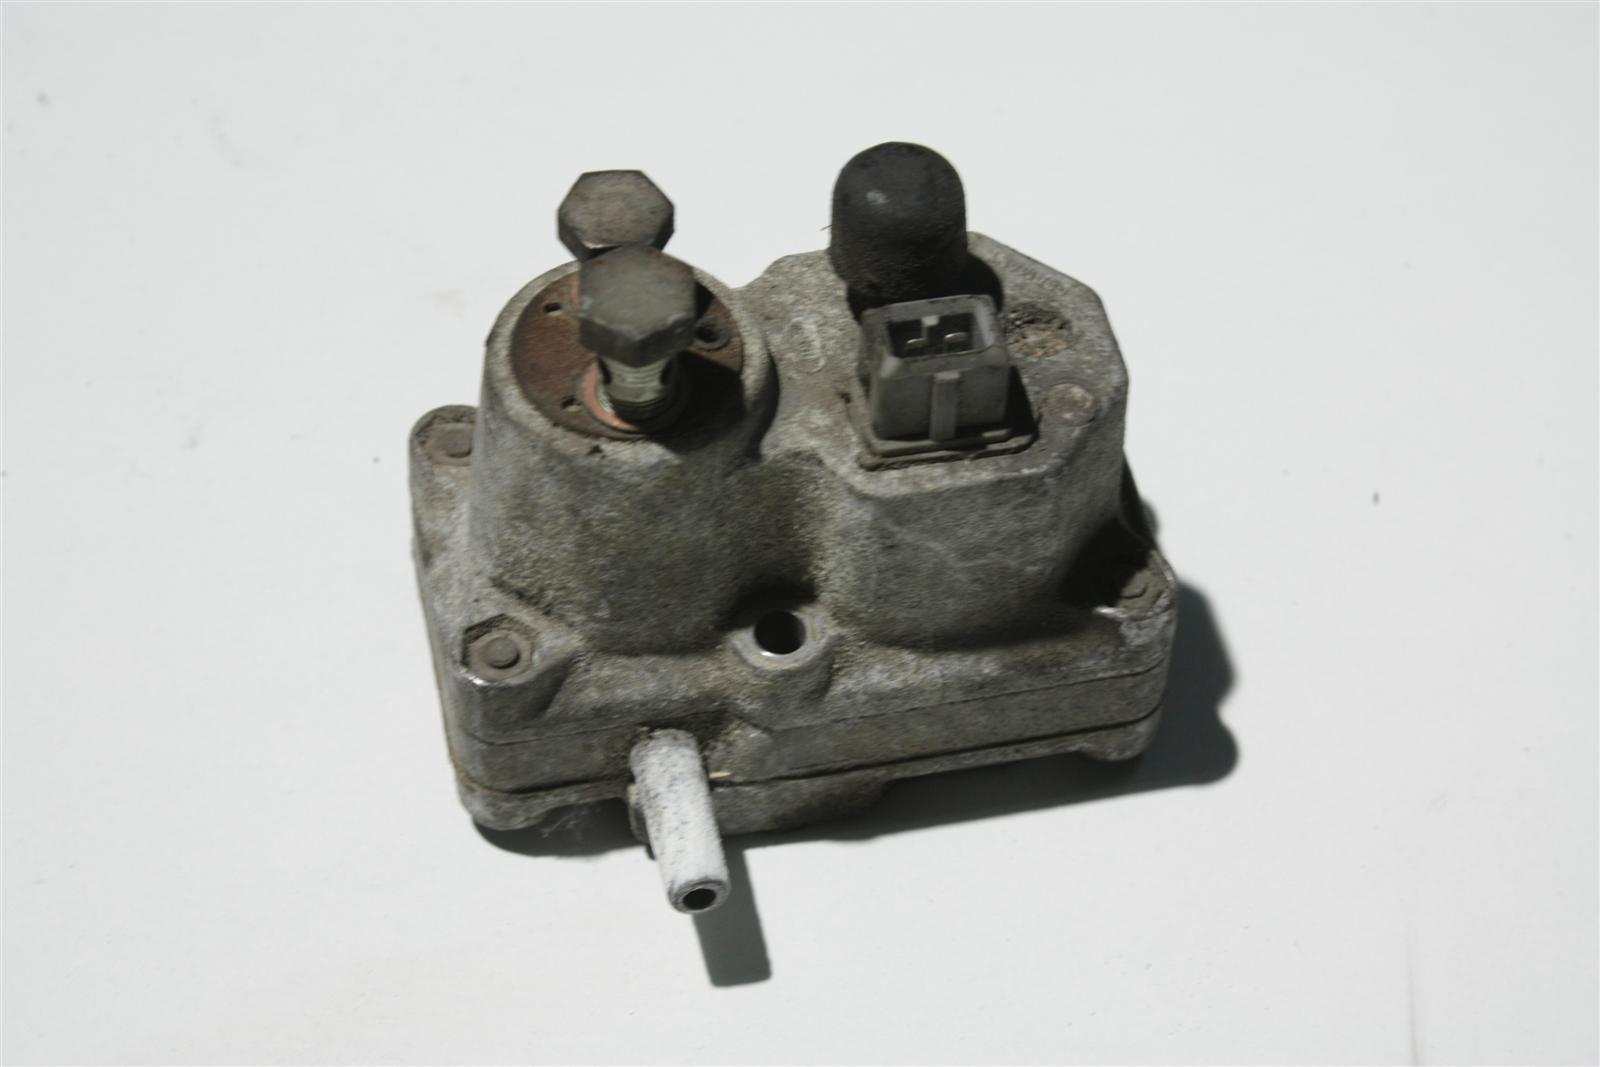 Audi 90 Typ 81/85/100 Typ 44 KV/HU/HY/HX etc. Warmlaufregler 034133403